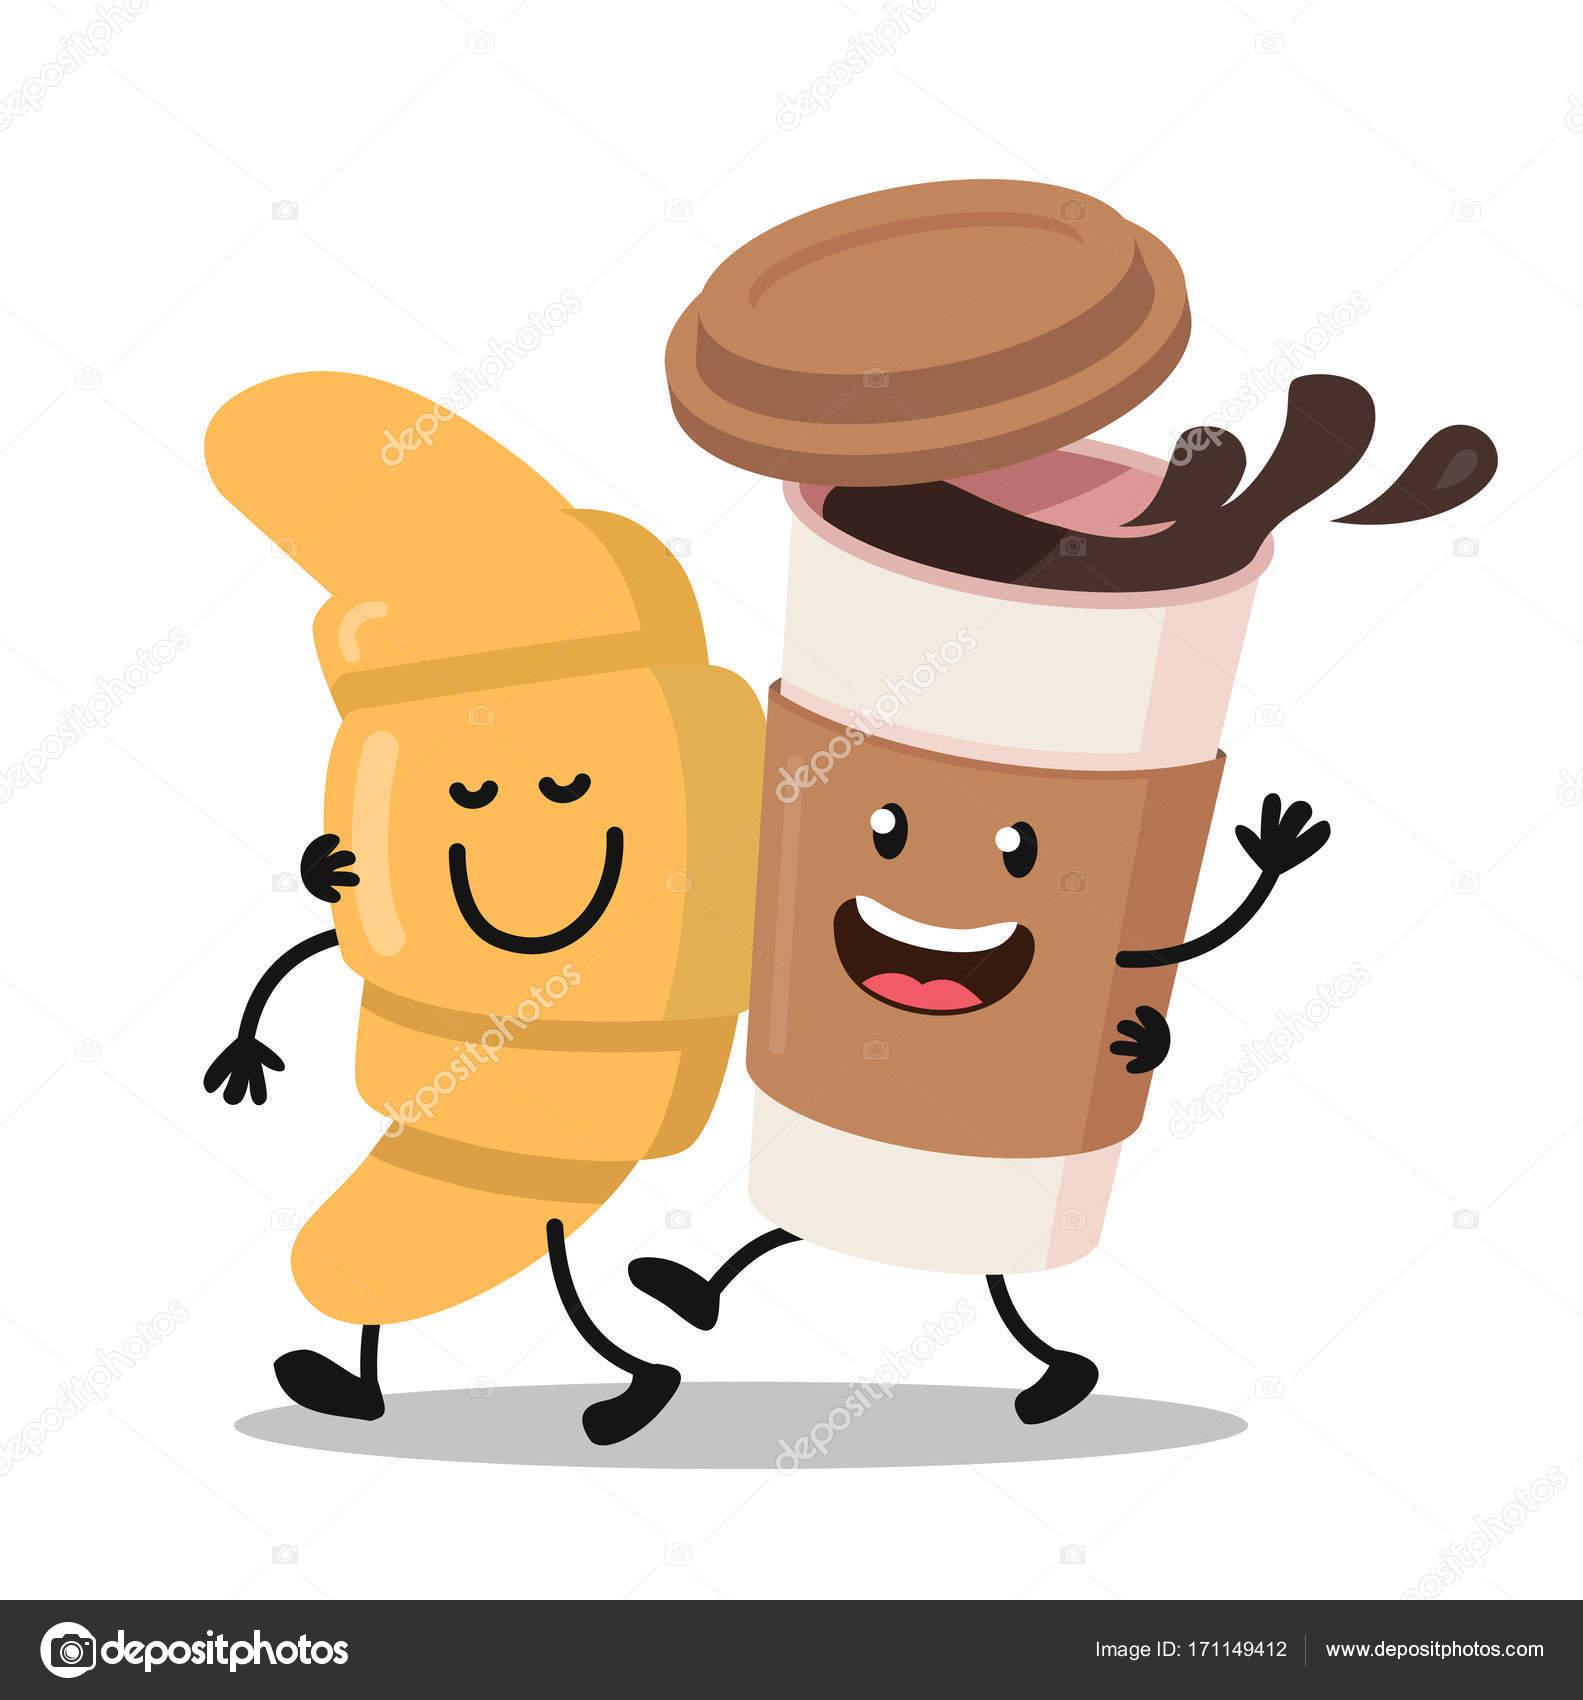 Lustige Comic Figuren Kaffee Und Croissant Stockvektor C Bioraven